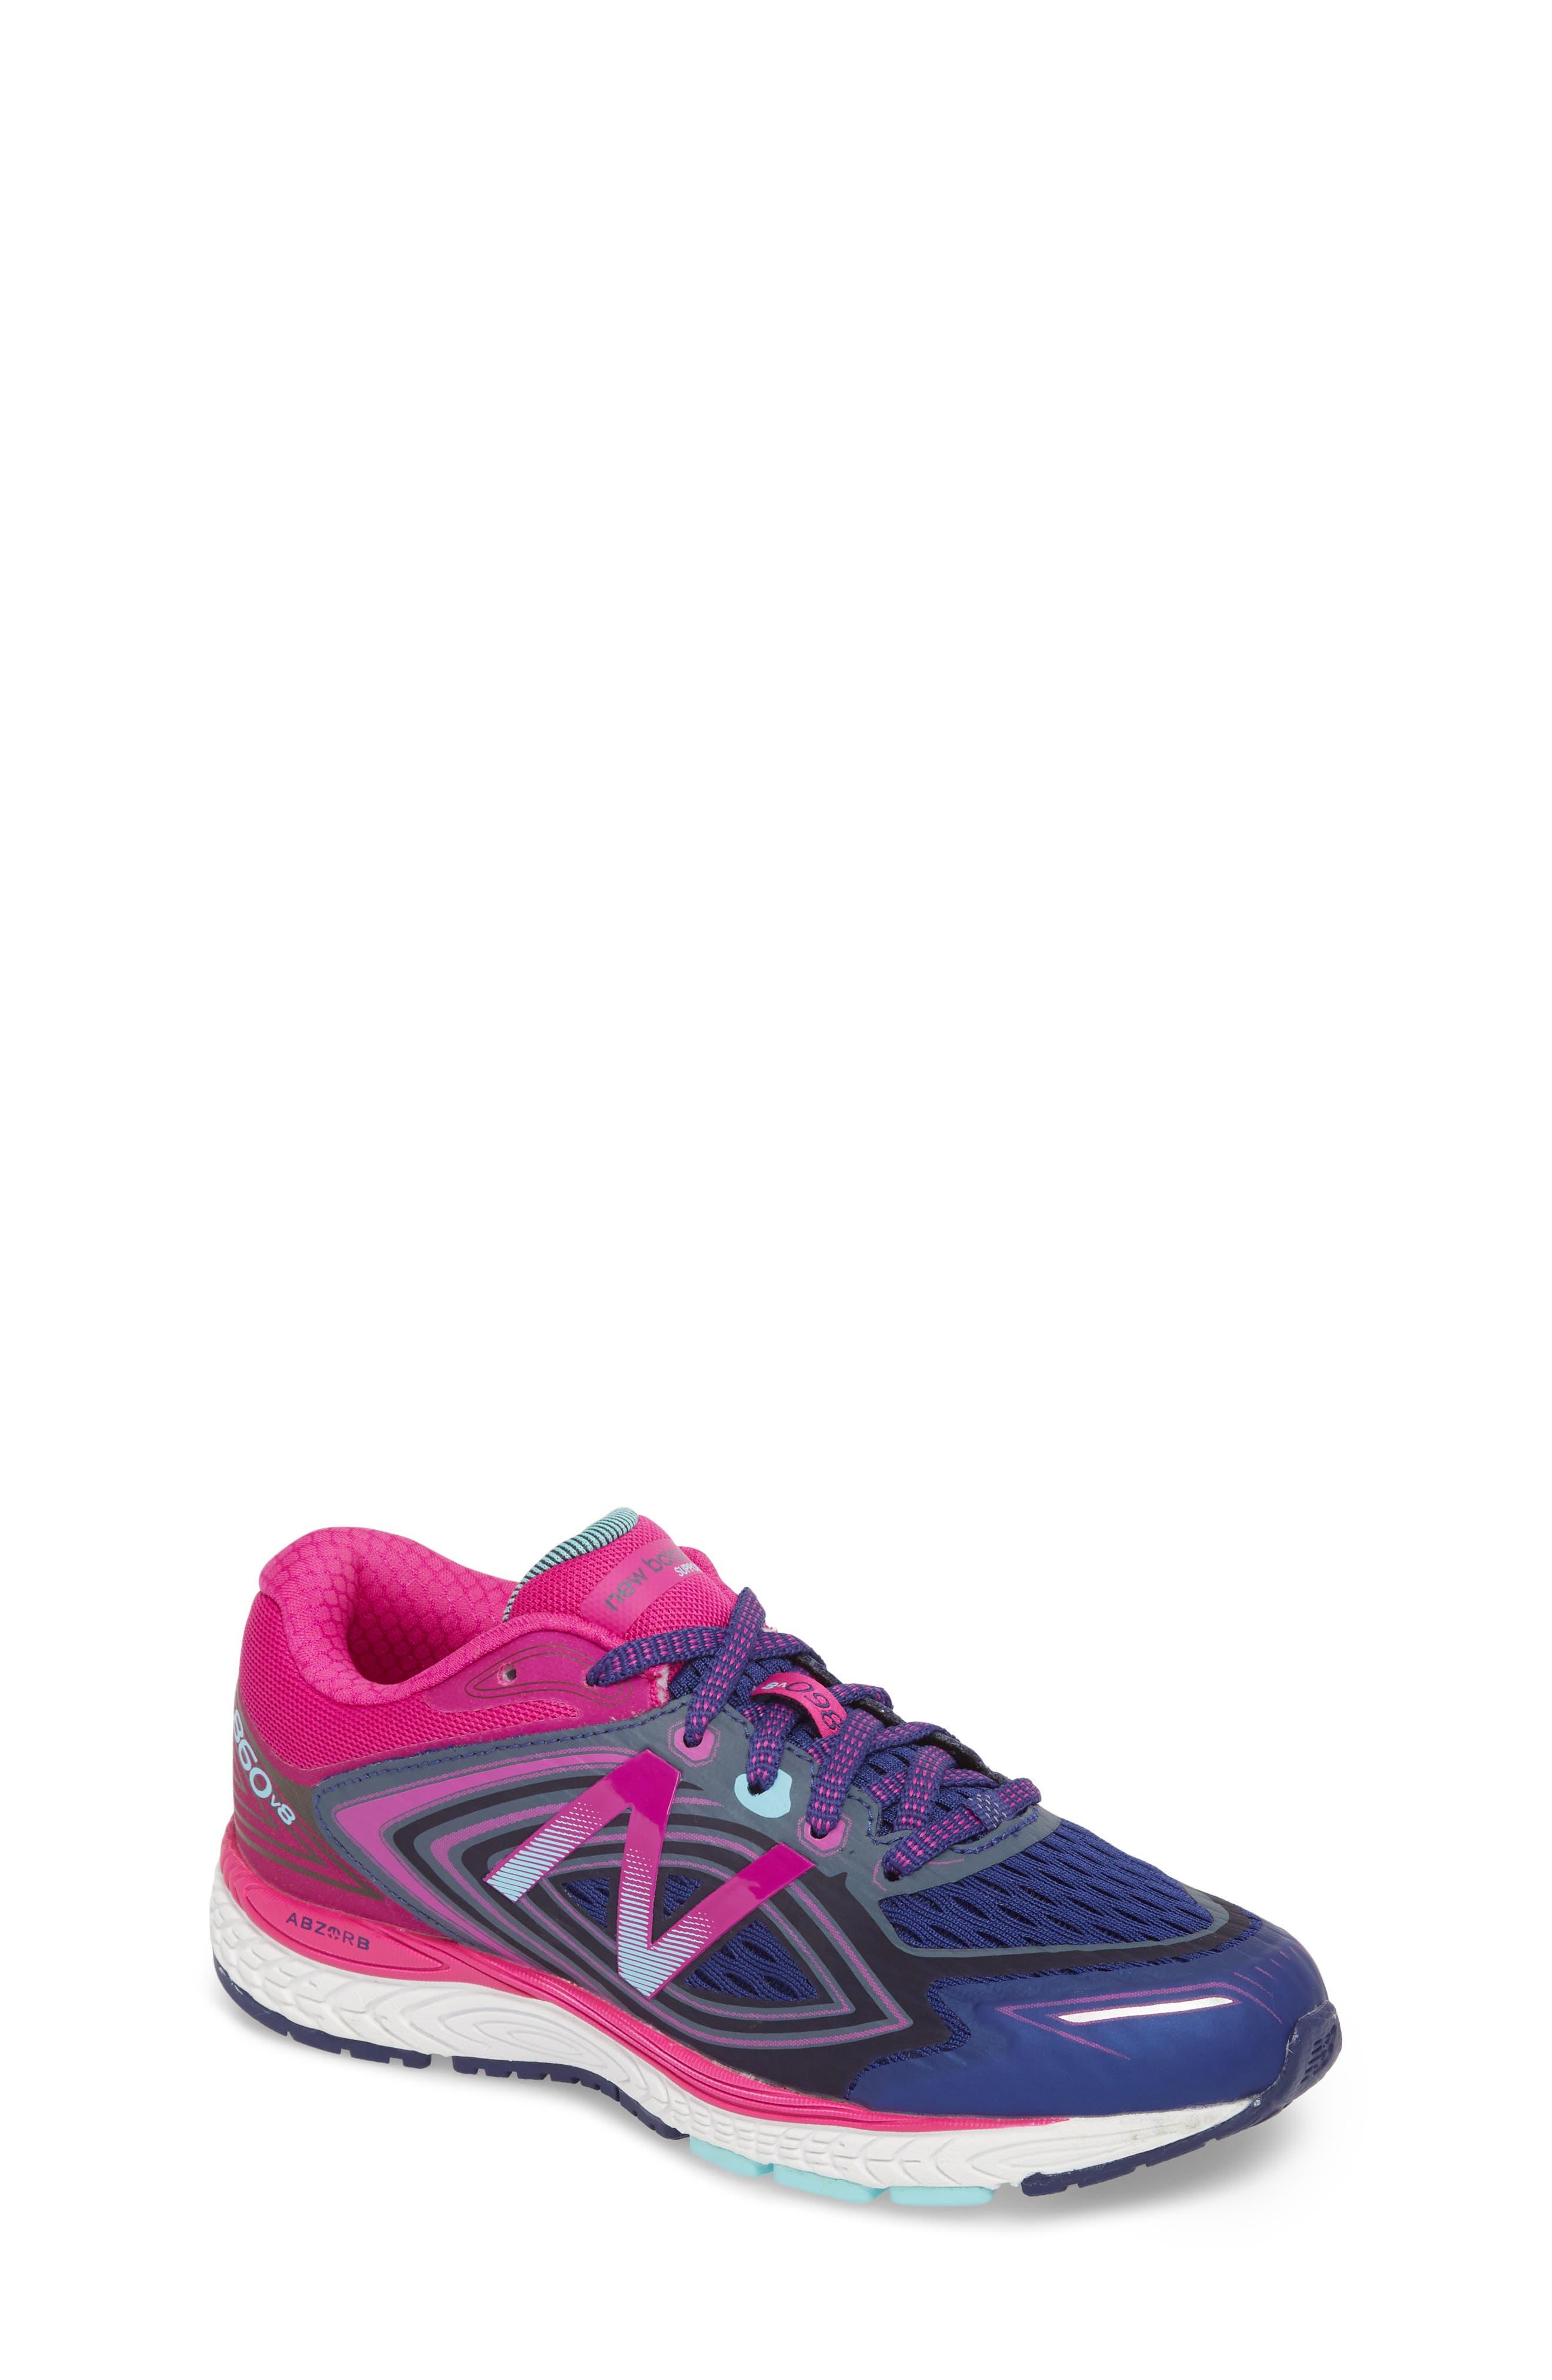 860v8 Sneaker,                             Main thumbnail 1, color,                             Navy